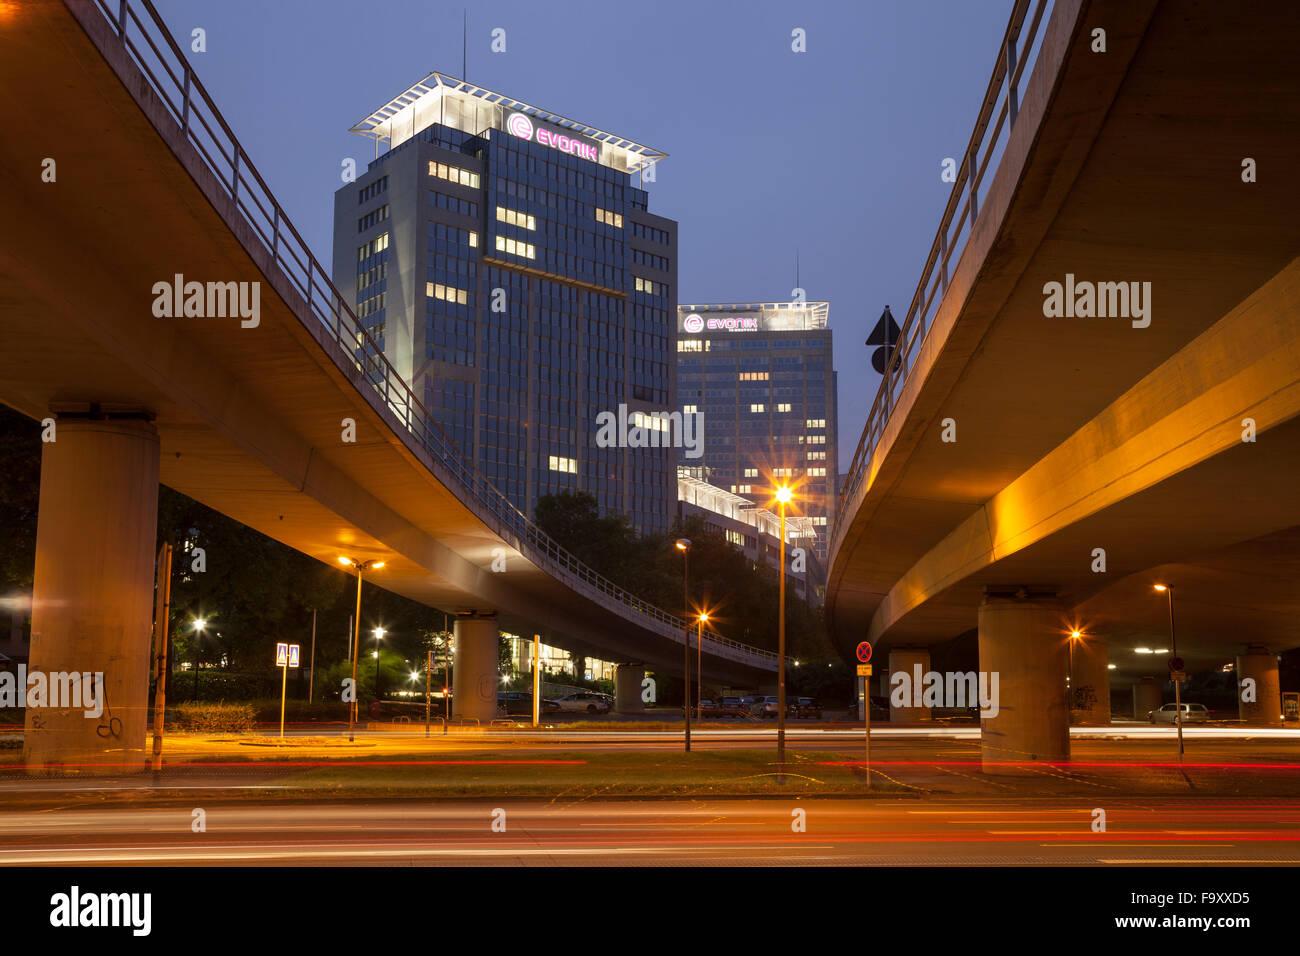 Germany, North Rhine-Westphalia, Essen, headquarters Evonik Industries, elevated road in the evening - Stock Image